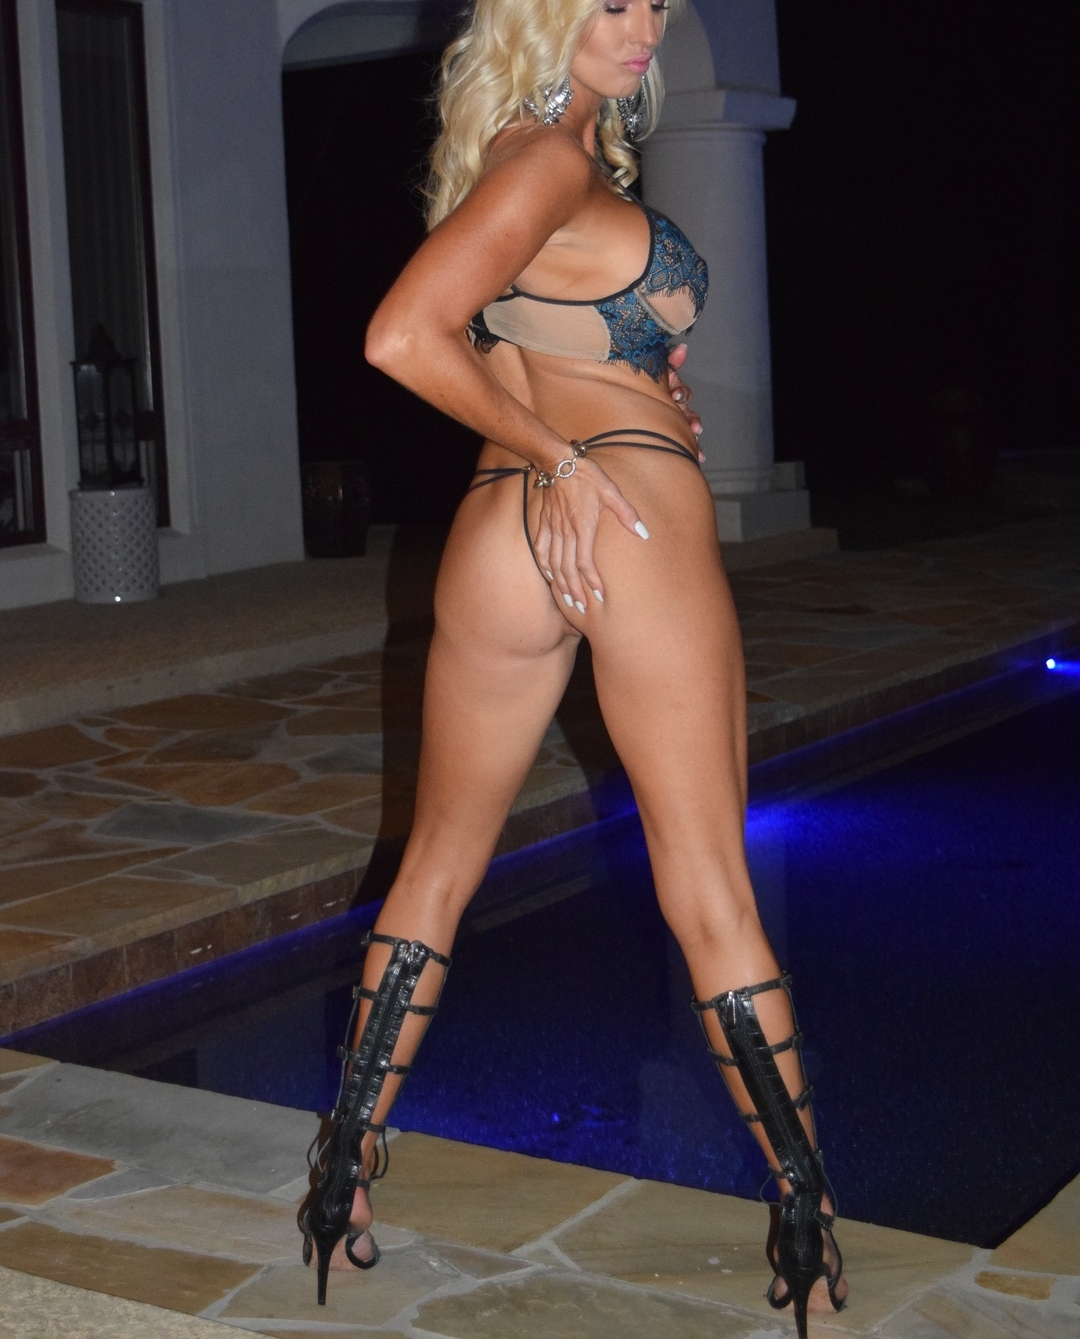 Bellasouth Lavidahermosa Onlyfans Nudes Leaks 0034